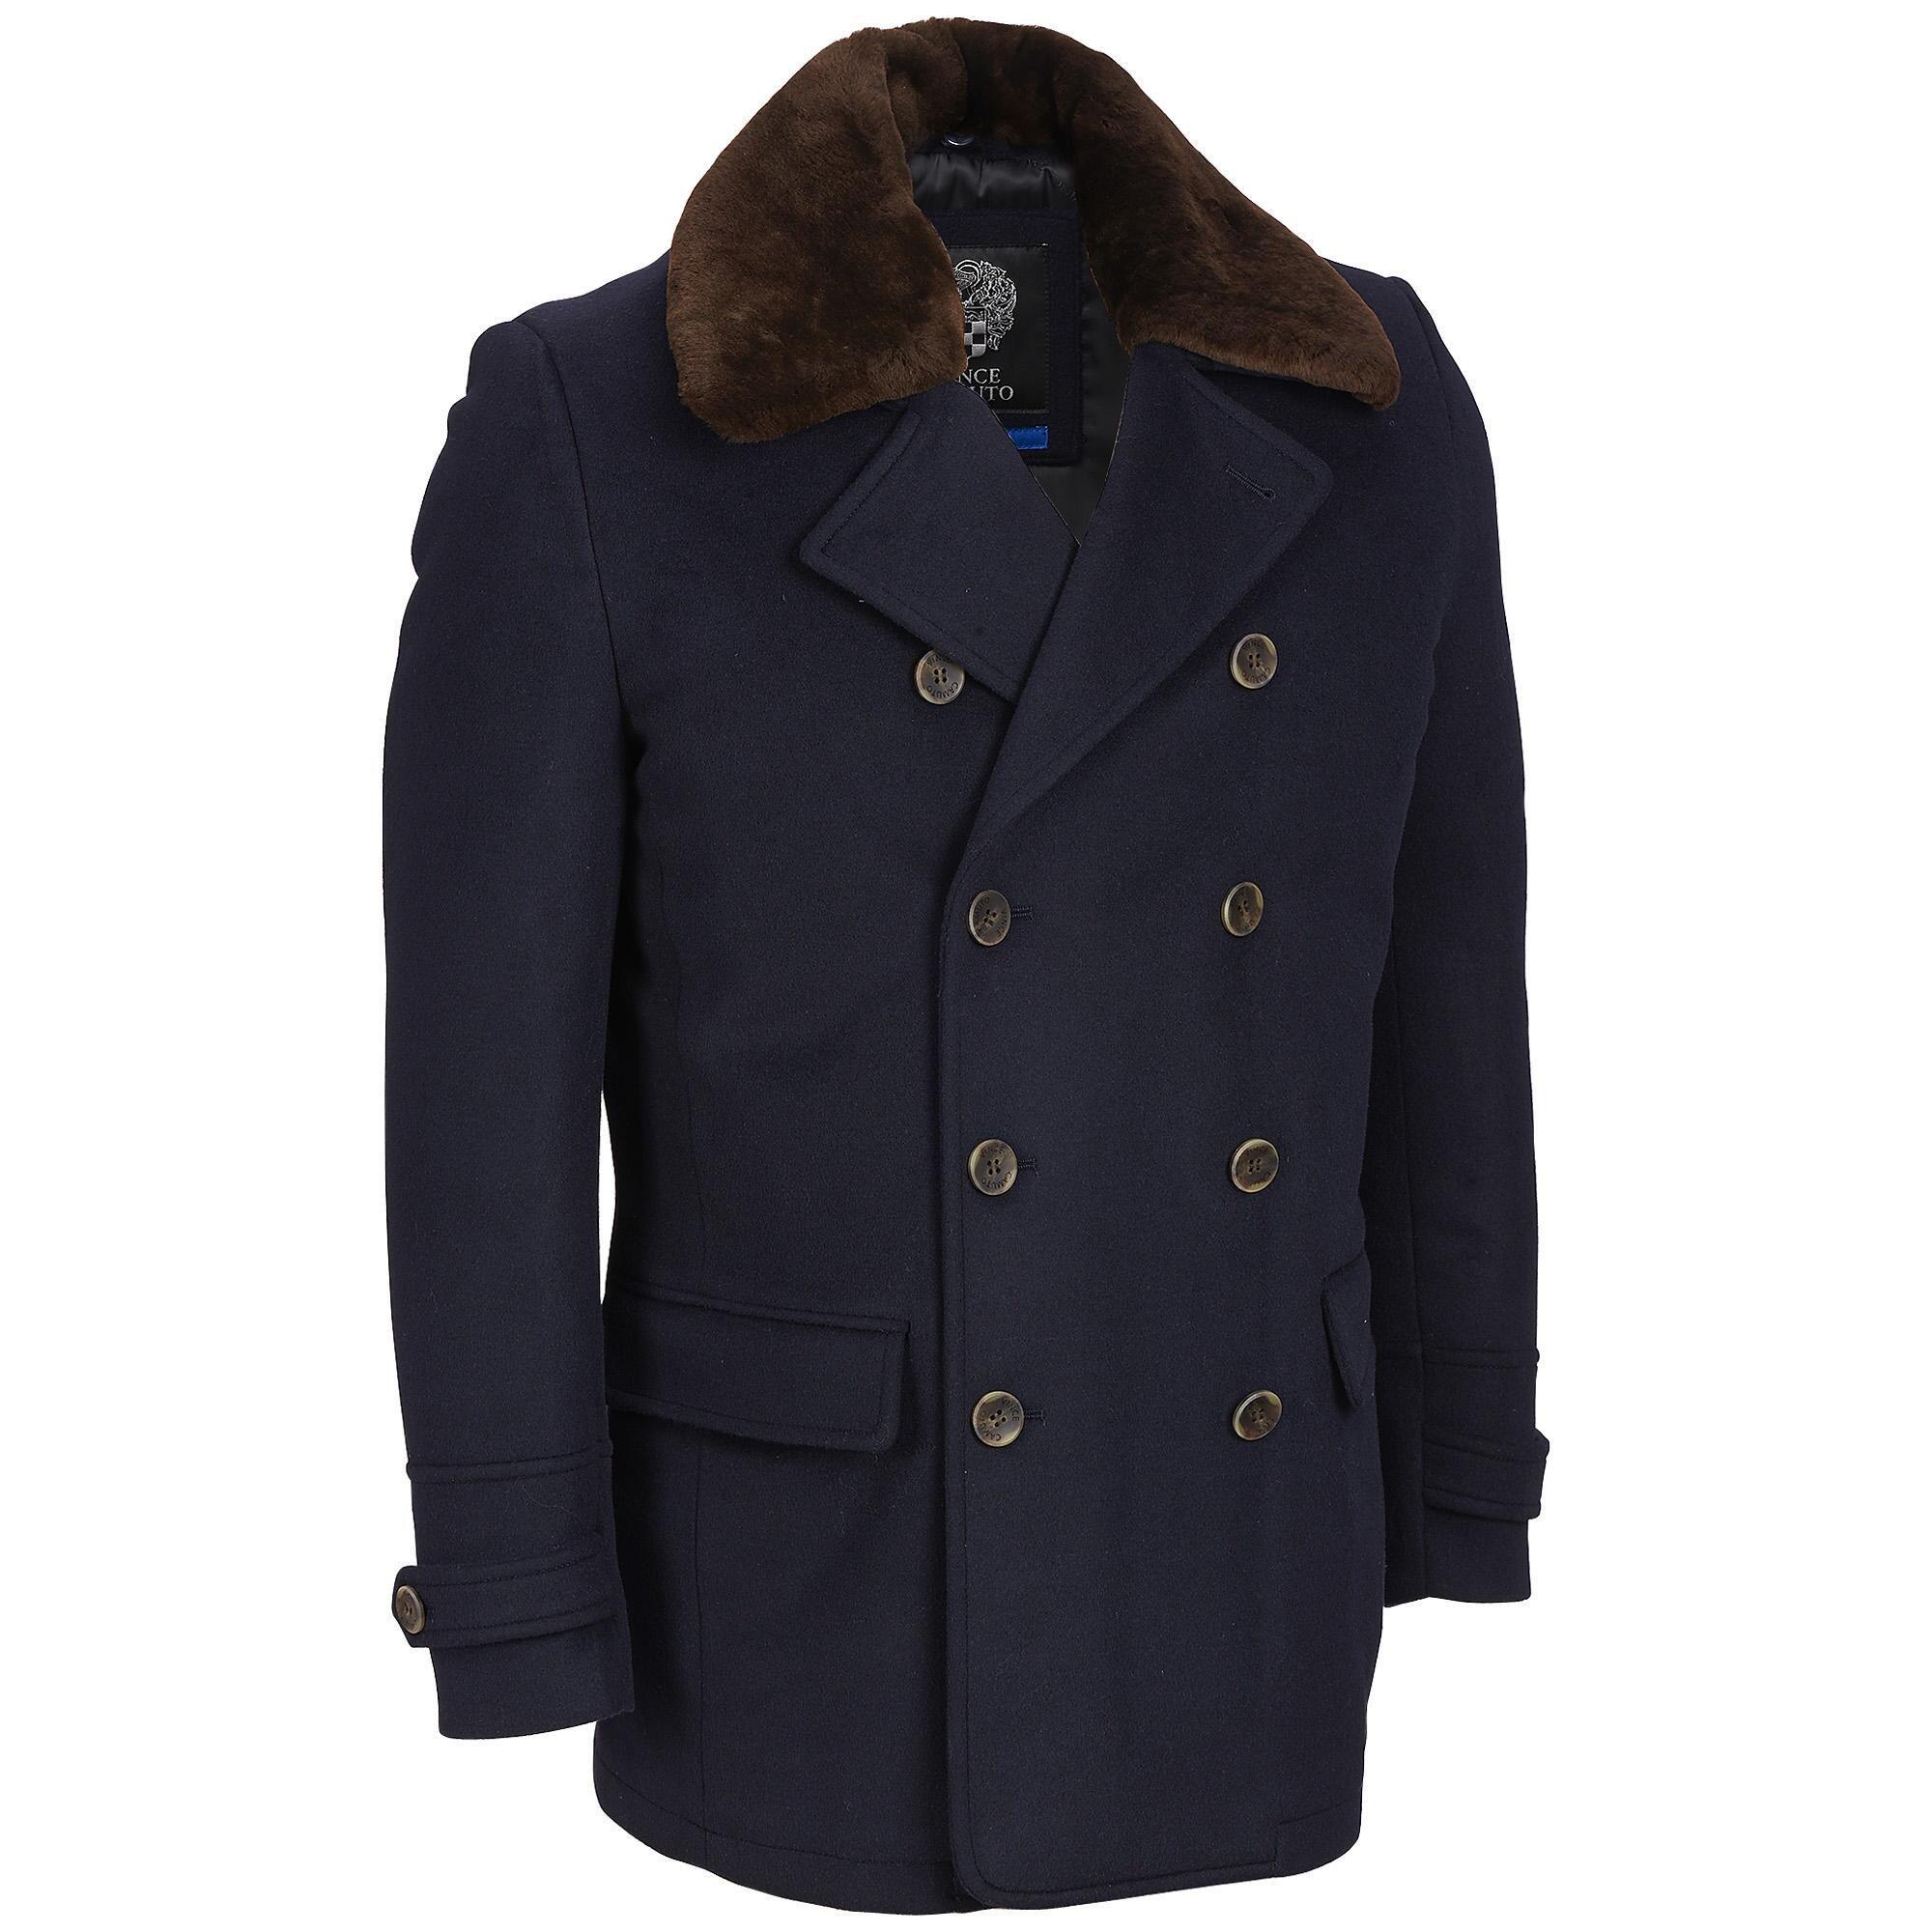 Vince Camuto Wool Blend Coat W Lamb Fur Collar View All Coat Wool Blend Coat Wool Peacoat [ 2000 x 2000 Pixel ]